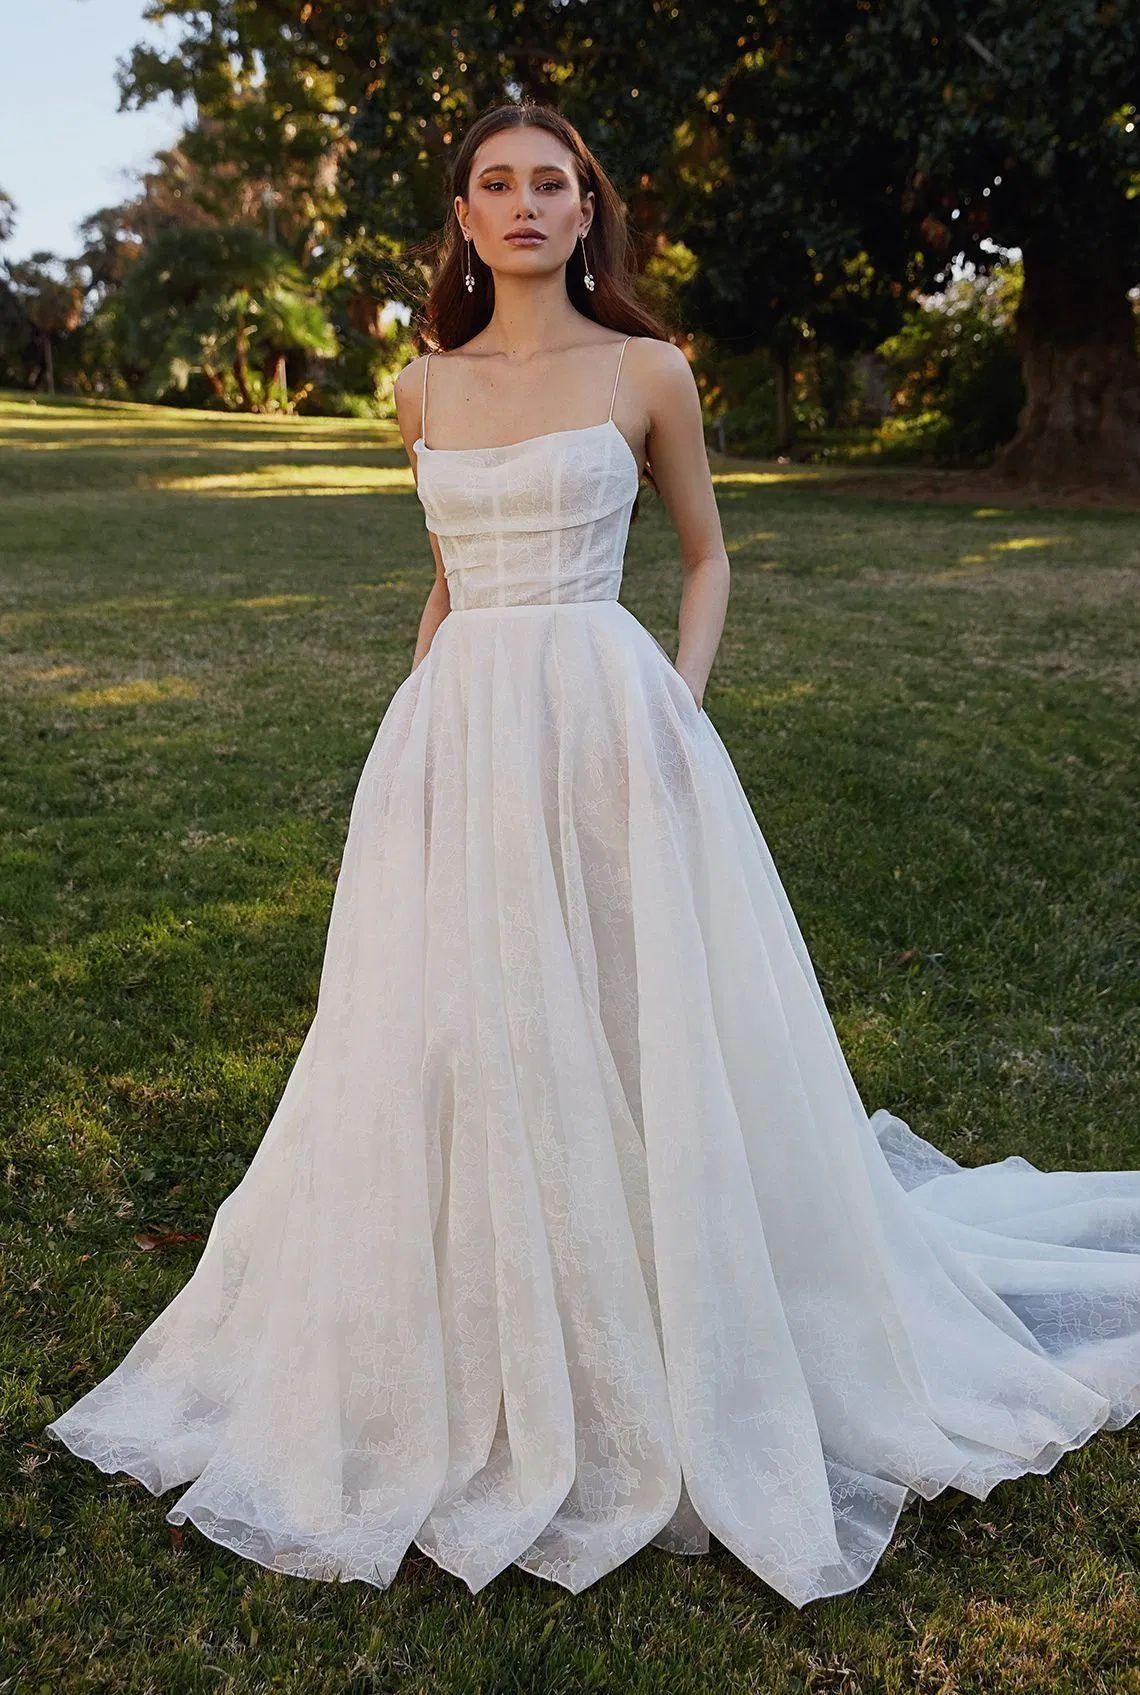 These Wedding Ideas Were Trending On Pinterset In 2020 Wedding Dresses Wedding Dresses Unique Wedding Dresses Simple [ 1695 x 1140 Pixel ]